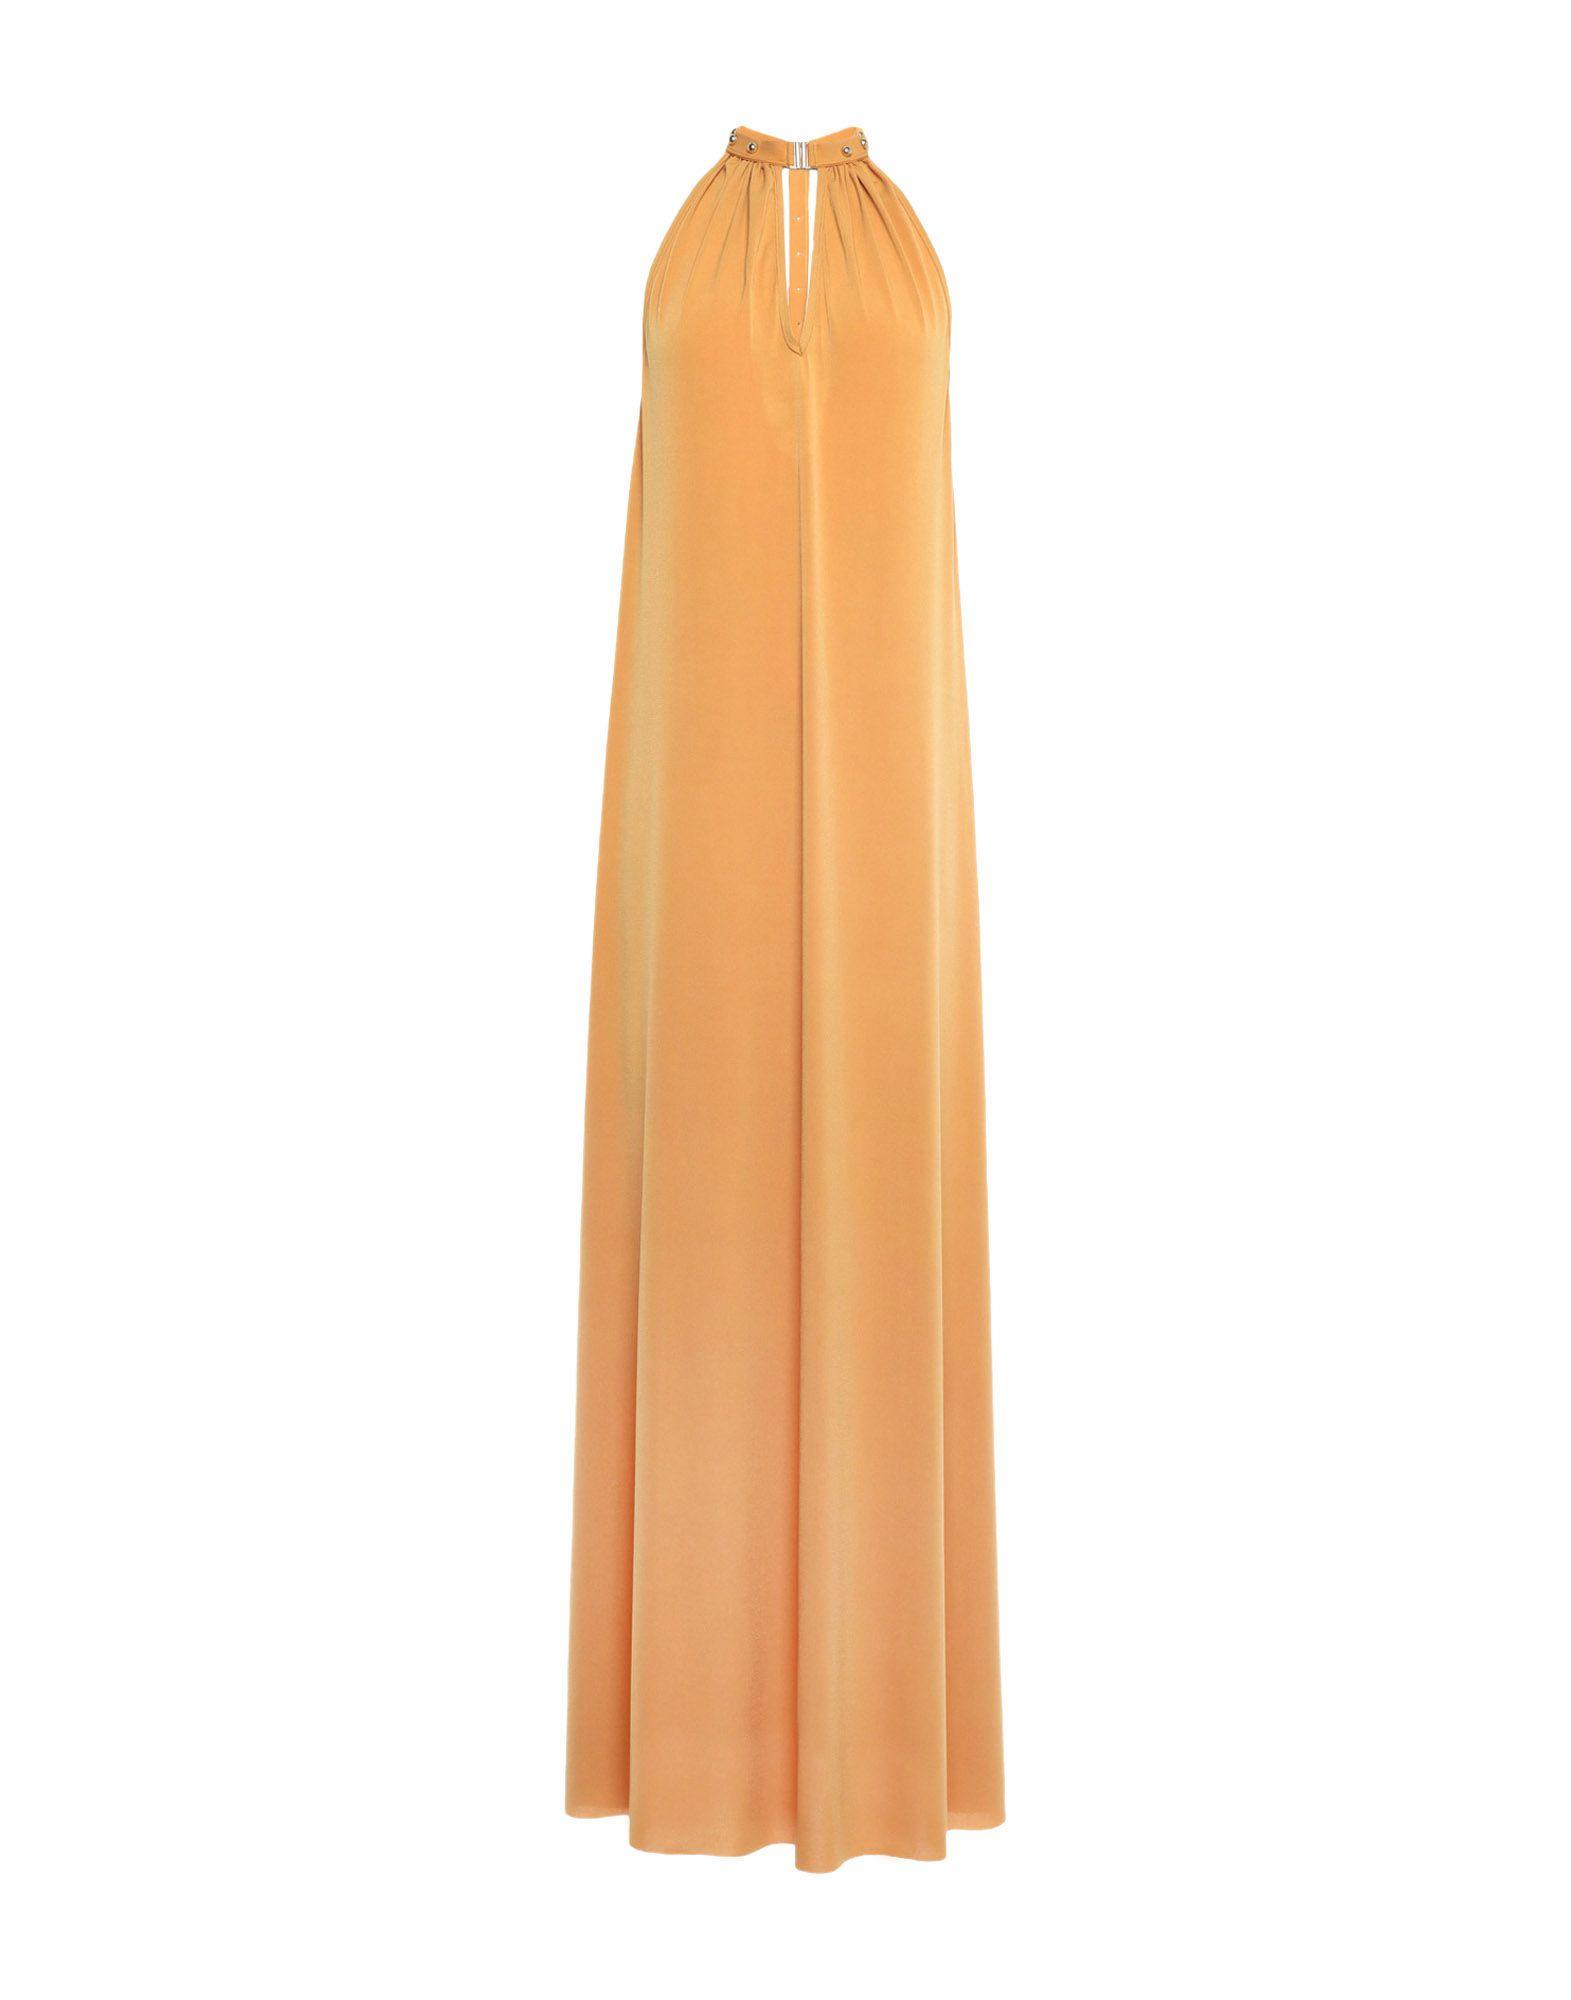 DISTRICT® by MARGHERITA MAZZEI Длинное платье margherita exclusively for yoox пижама